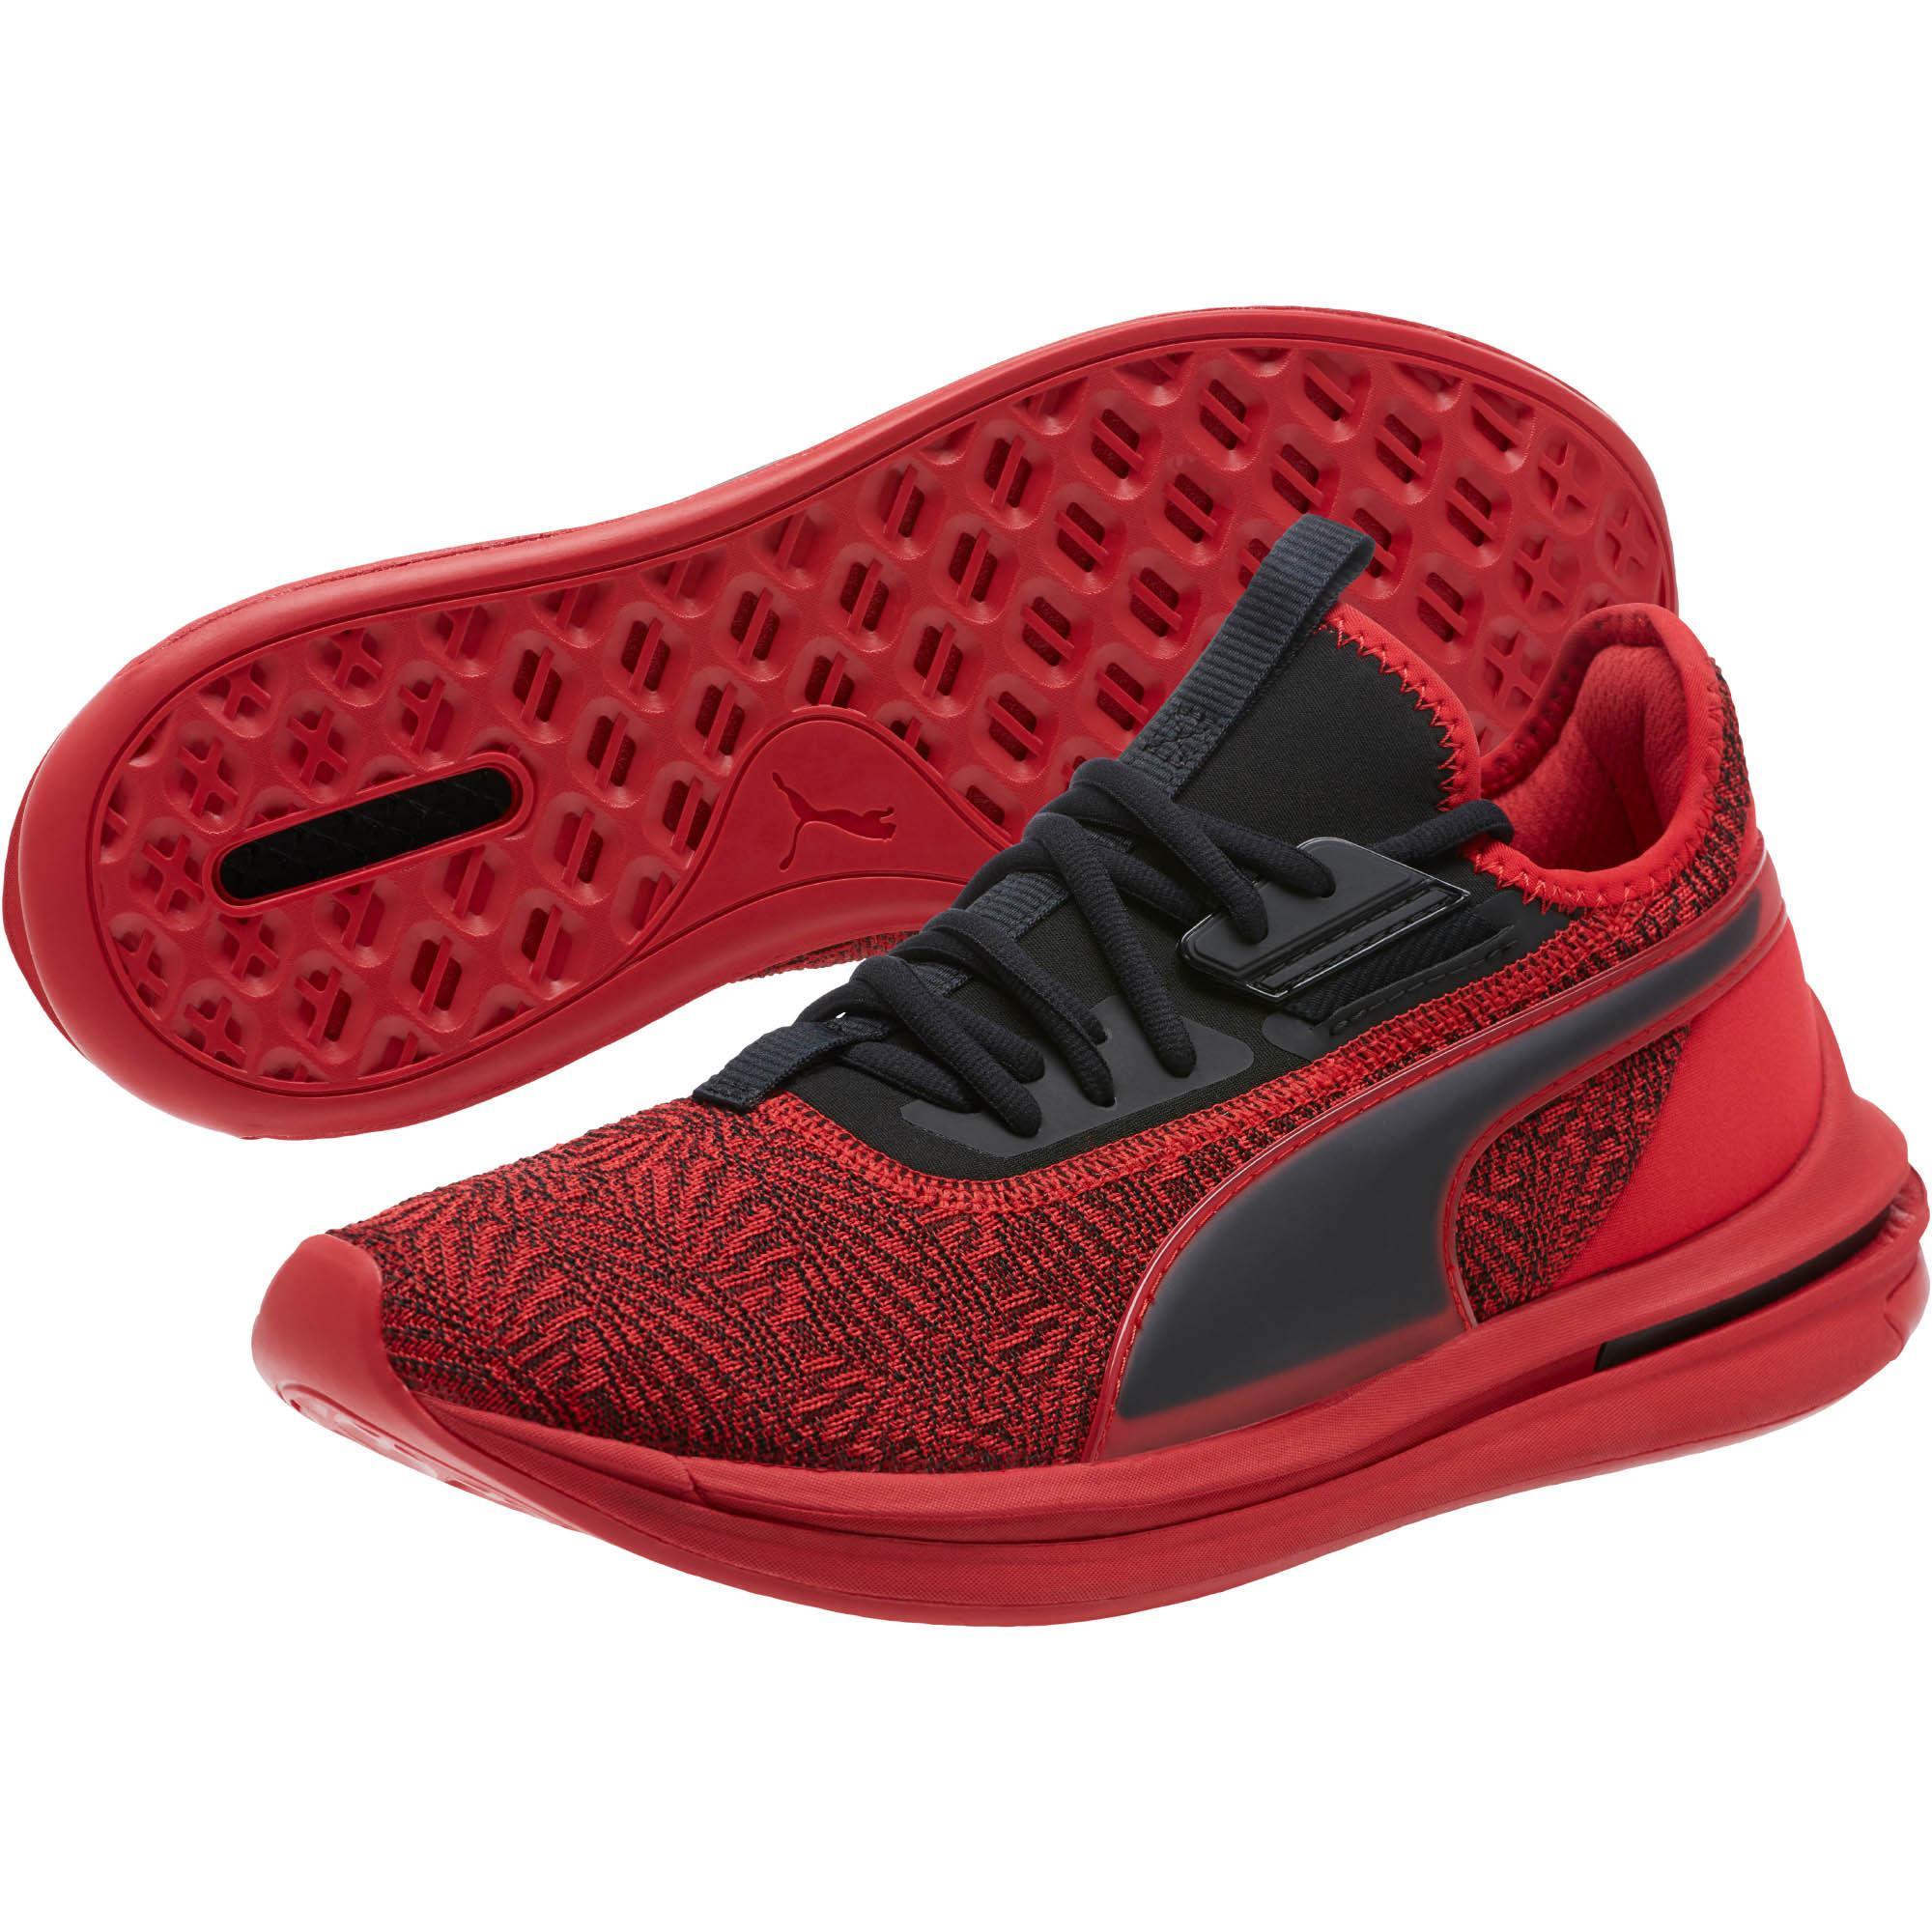 7a3584ebf28b PUMA - Red Ignite Limitless Sr-71 Running Shoes for Men - Lyst. View  fullscreen